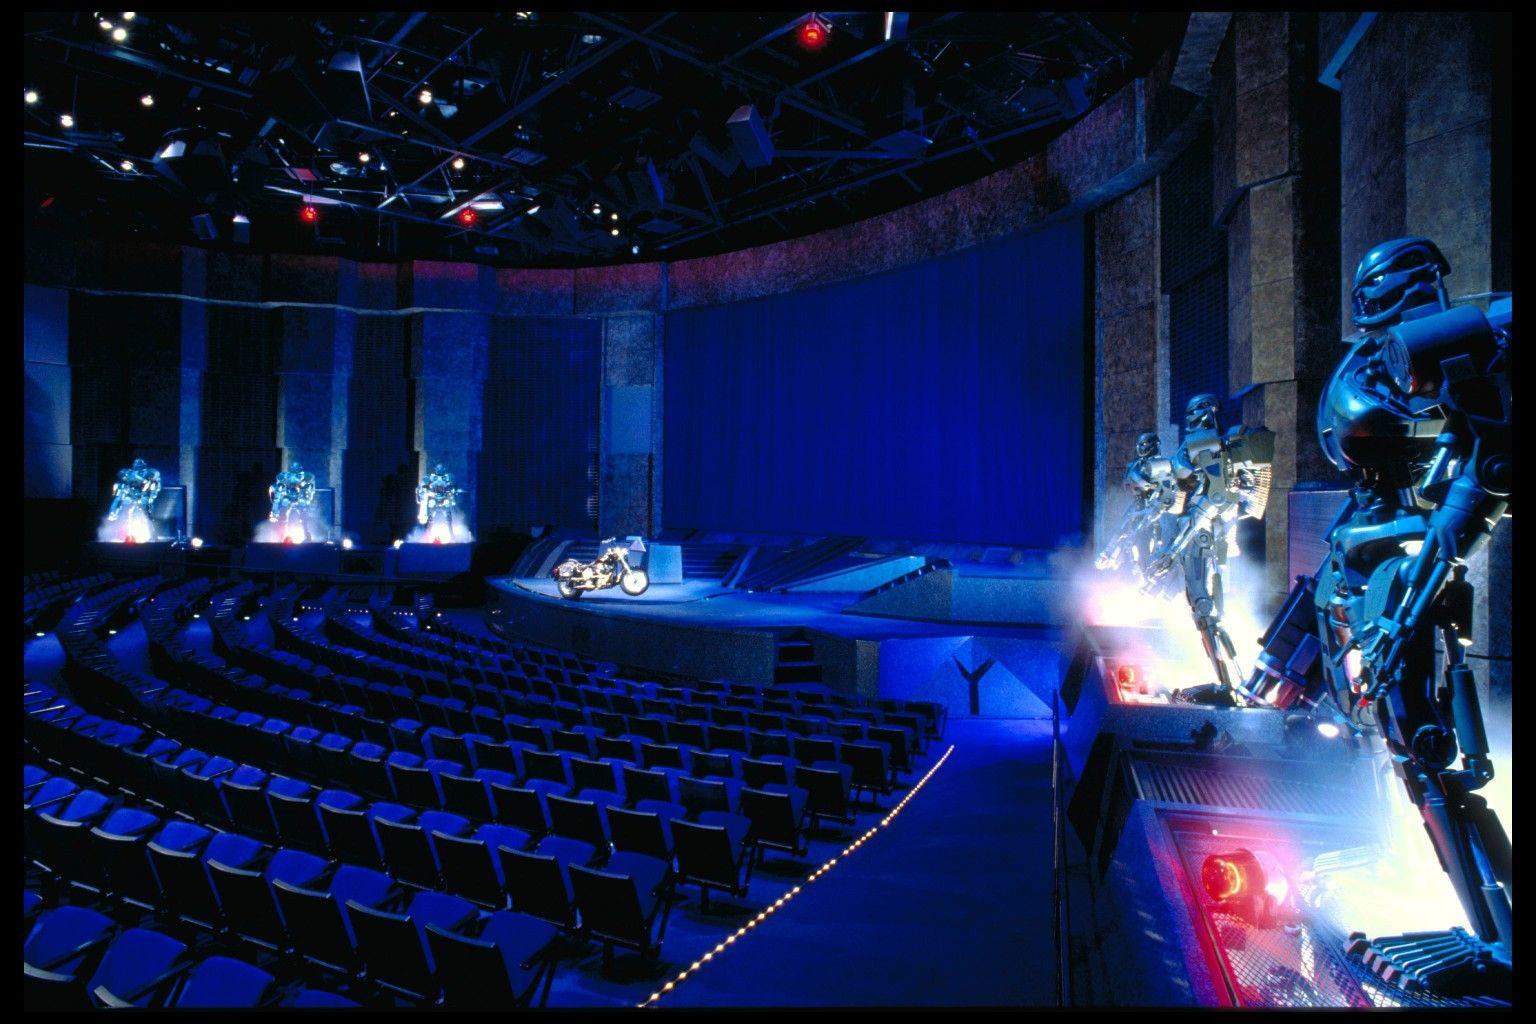 Universal Studios image by Michael Conlin Cultural arts